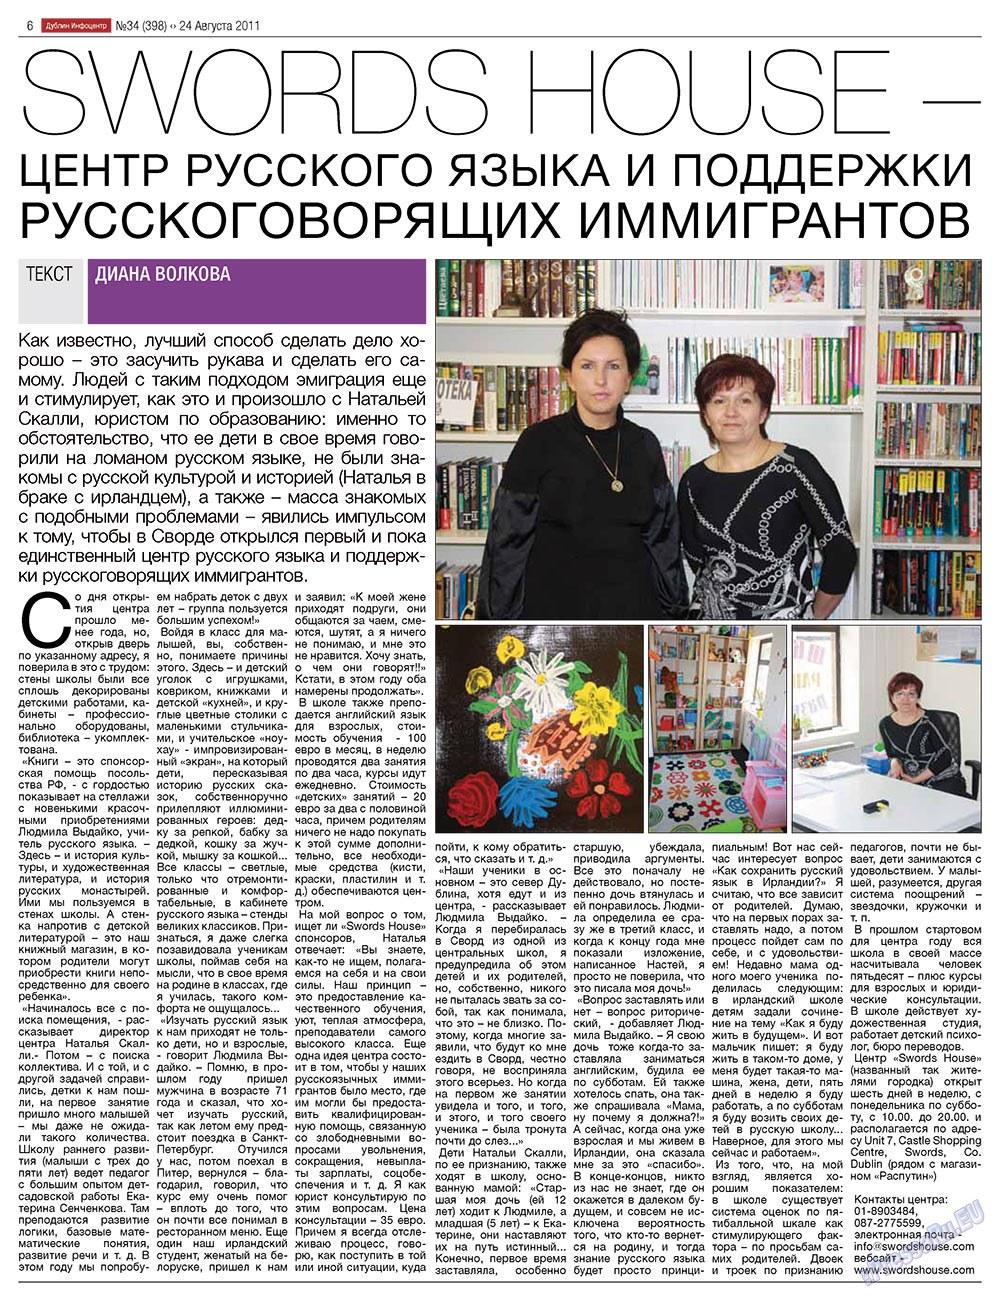 Дублин инфоцентр (газета). 2011 год, номер 34, стр. 6